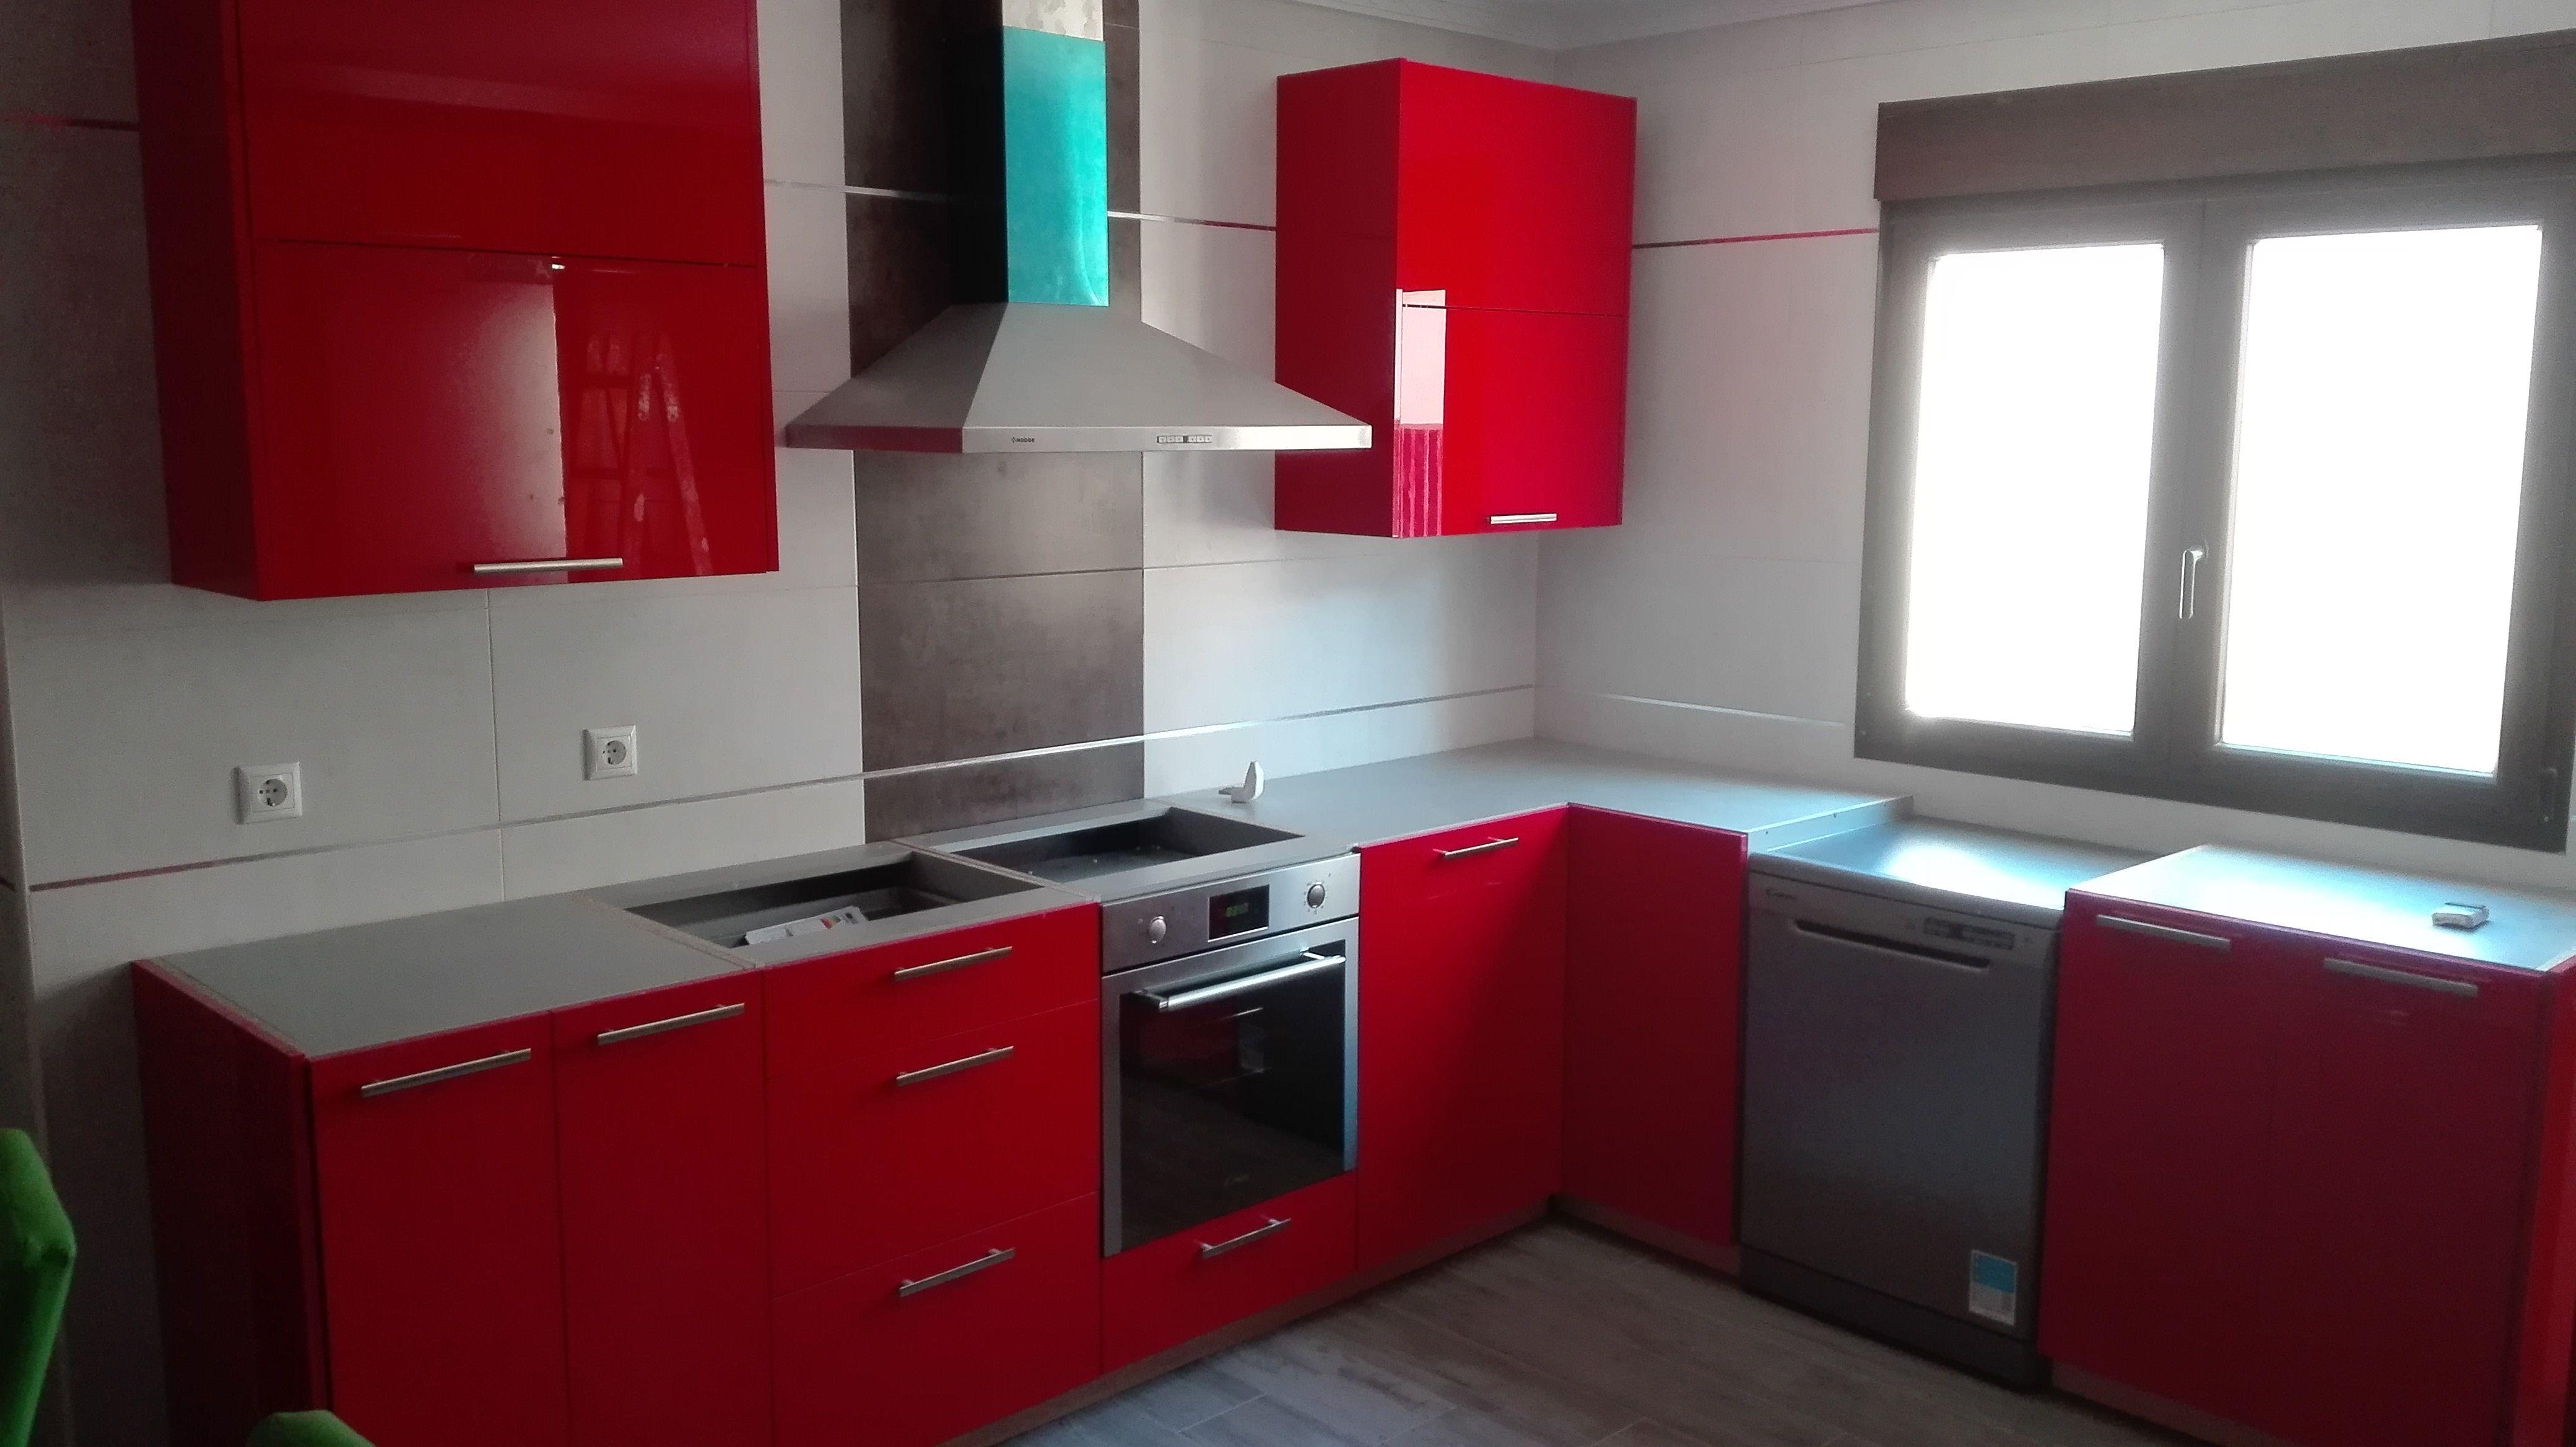 Muebles de cocina: Catálogo de Carpintería Tercero